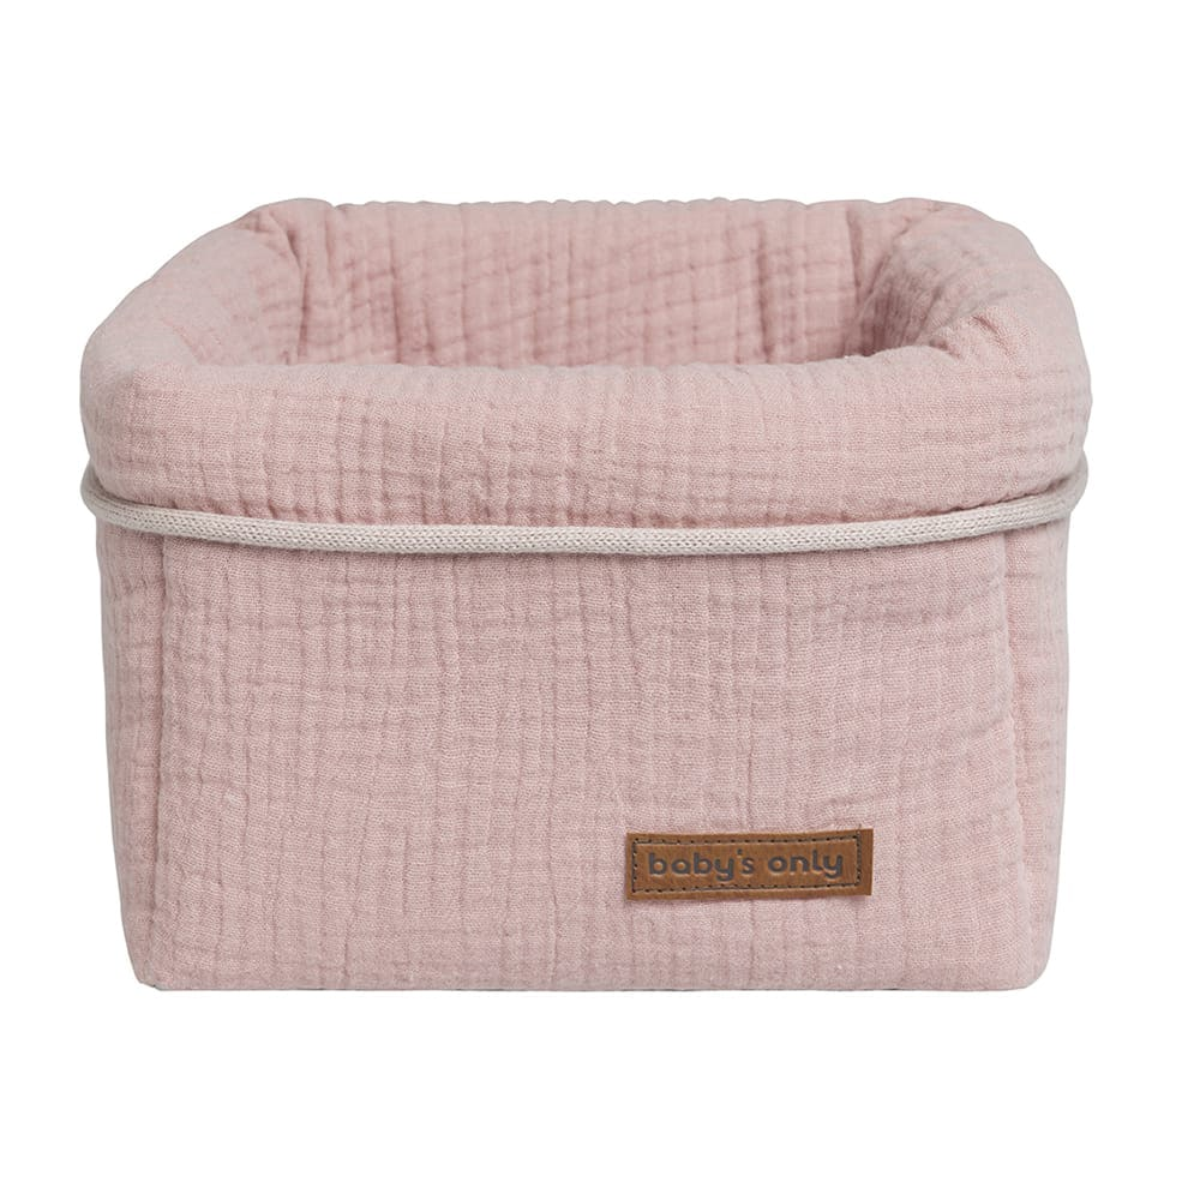 babys only 0233921 commodemandje breeze baby roze 1